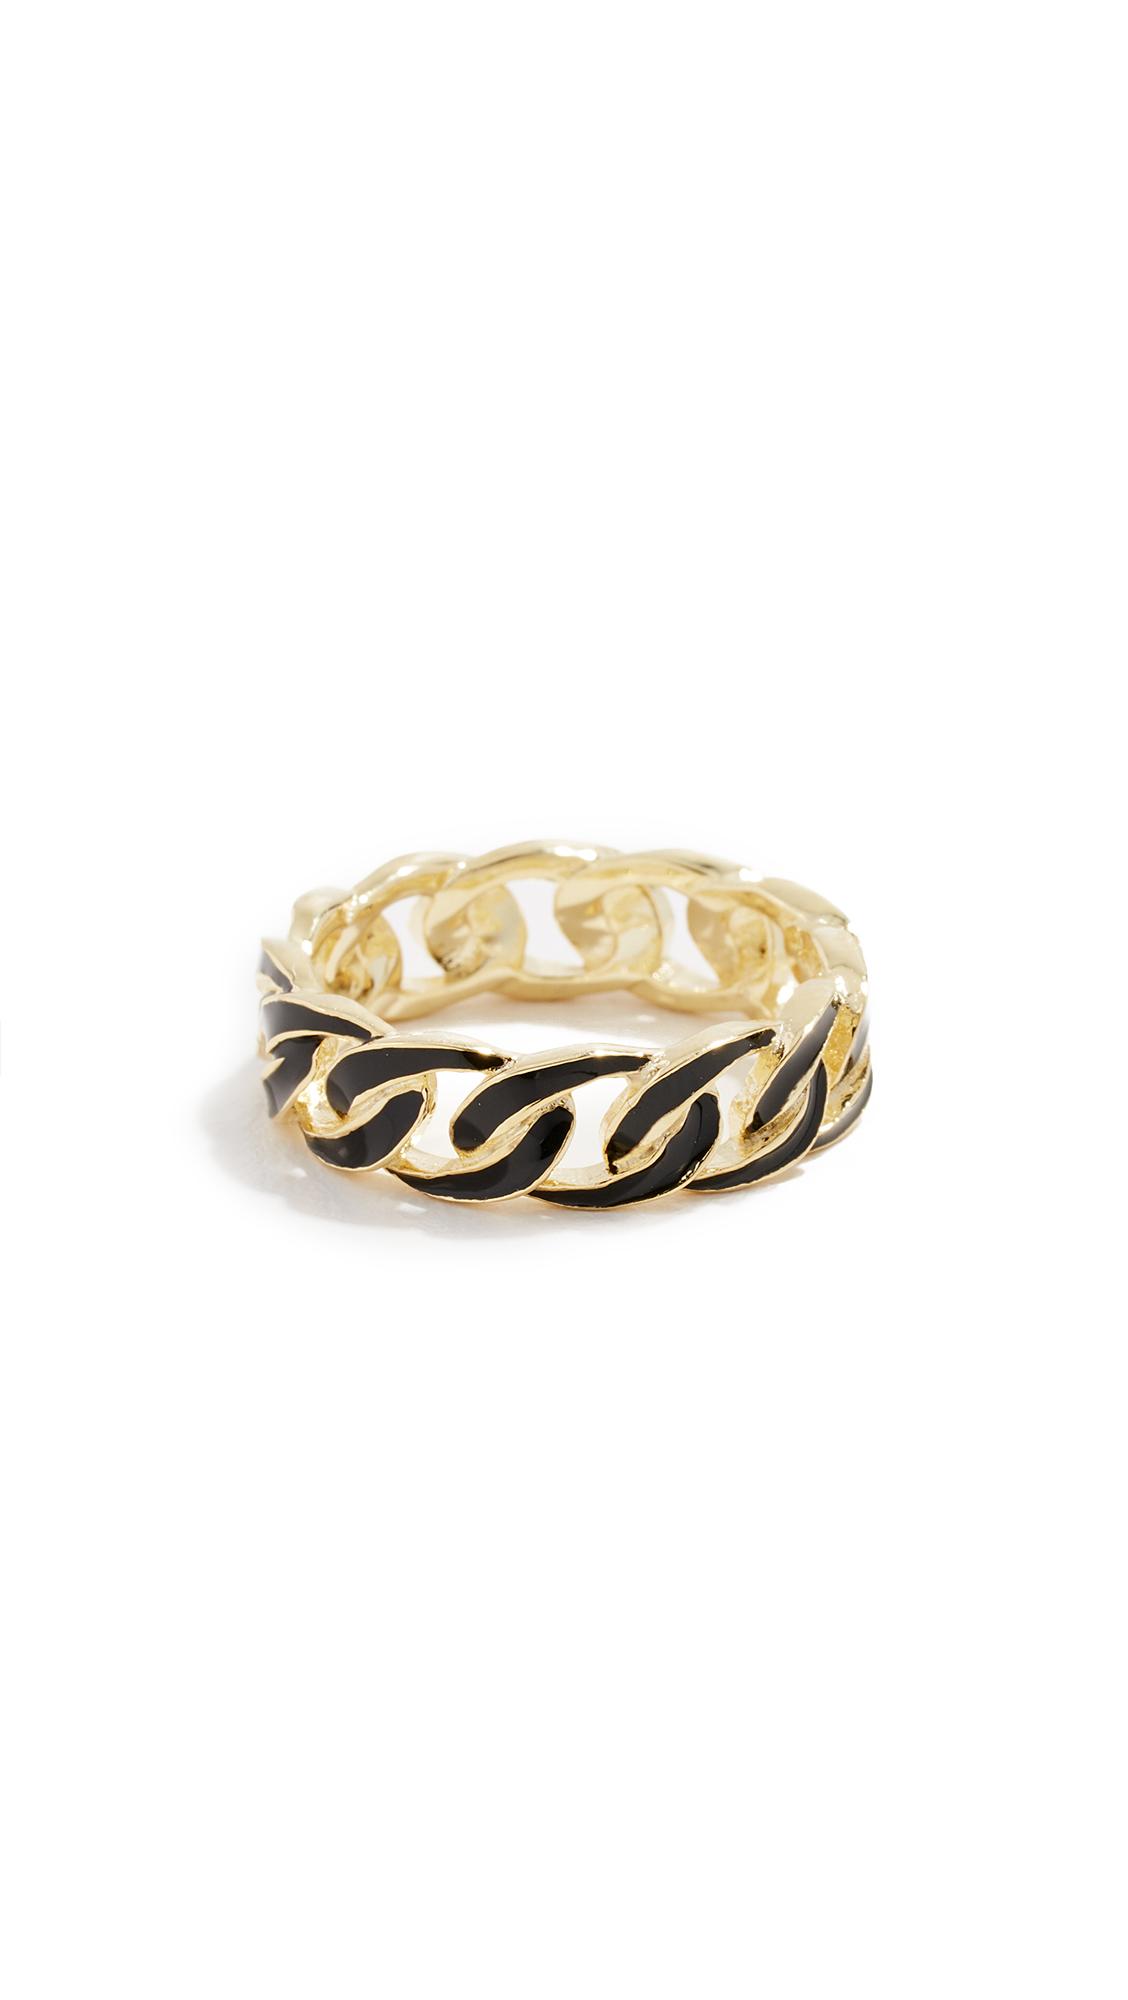 JENNIFER ZEUNER JEWELRY Charly Enamel Ring in Gold/Black